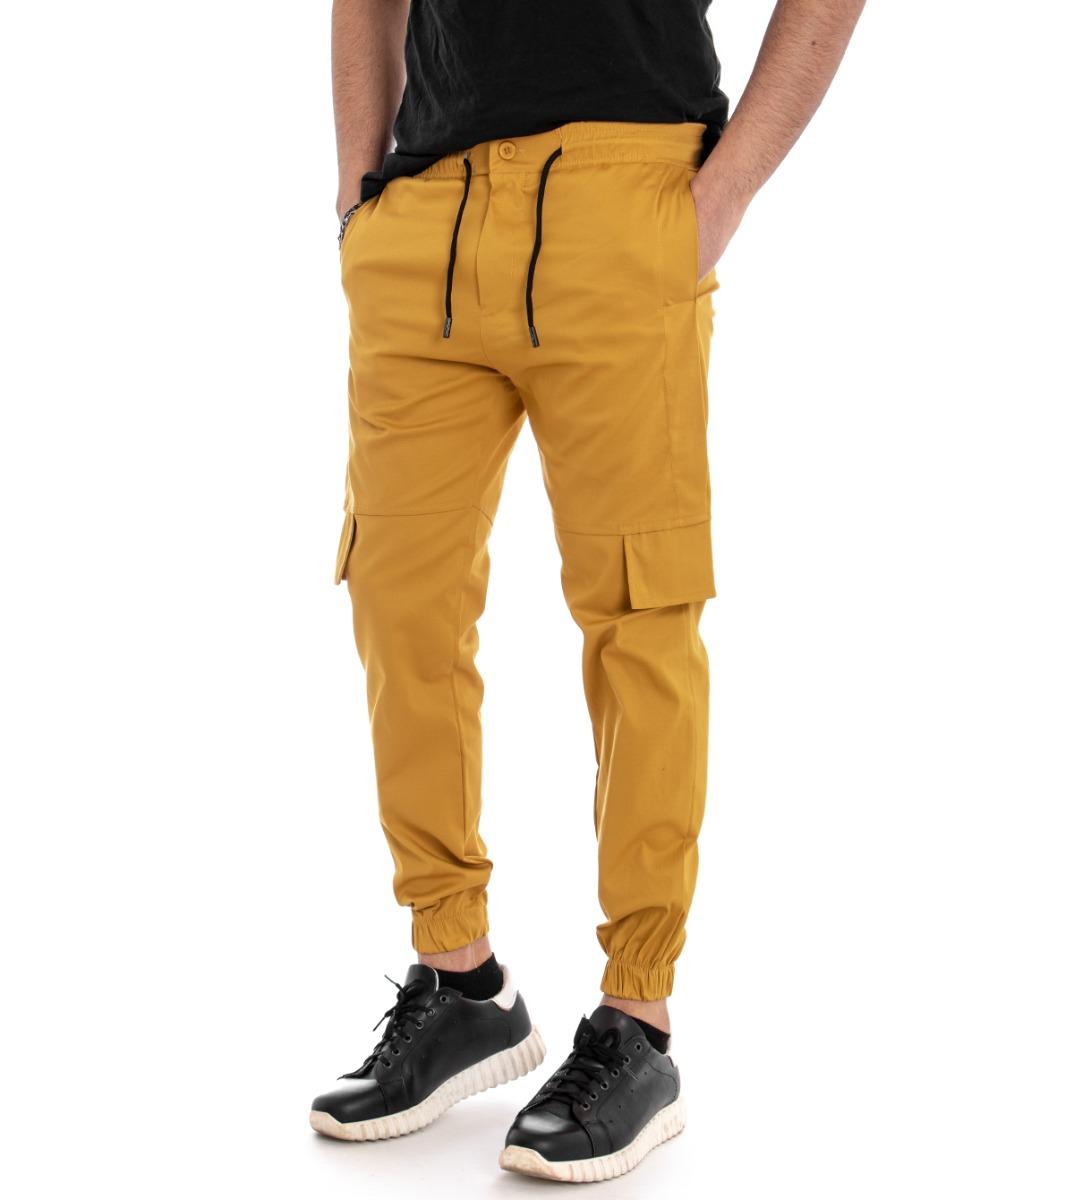 mejor servicio f5a2c 31dca Detalles de Pantalones Hombre Panta Chándal Color Liso Mostaza Tiro Caído  Casual Giosal